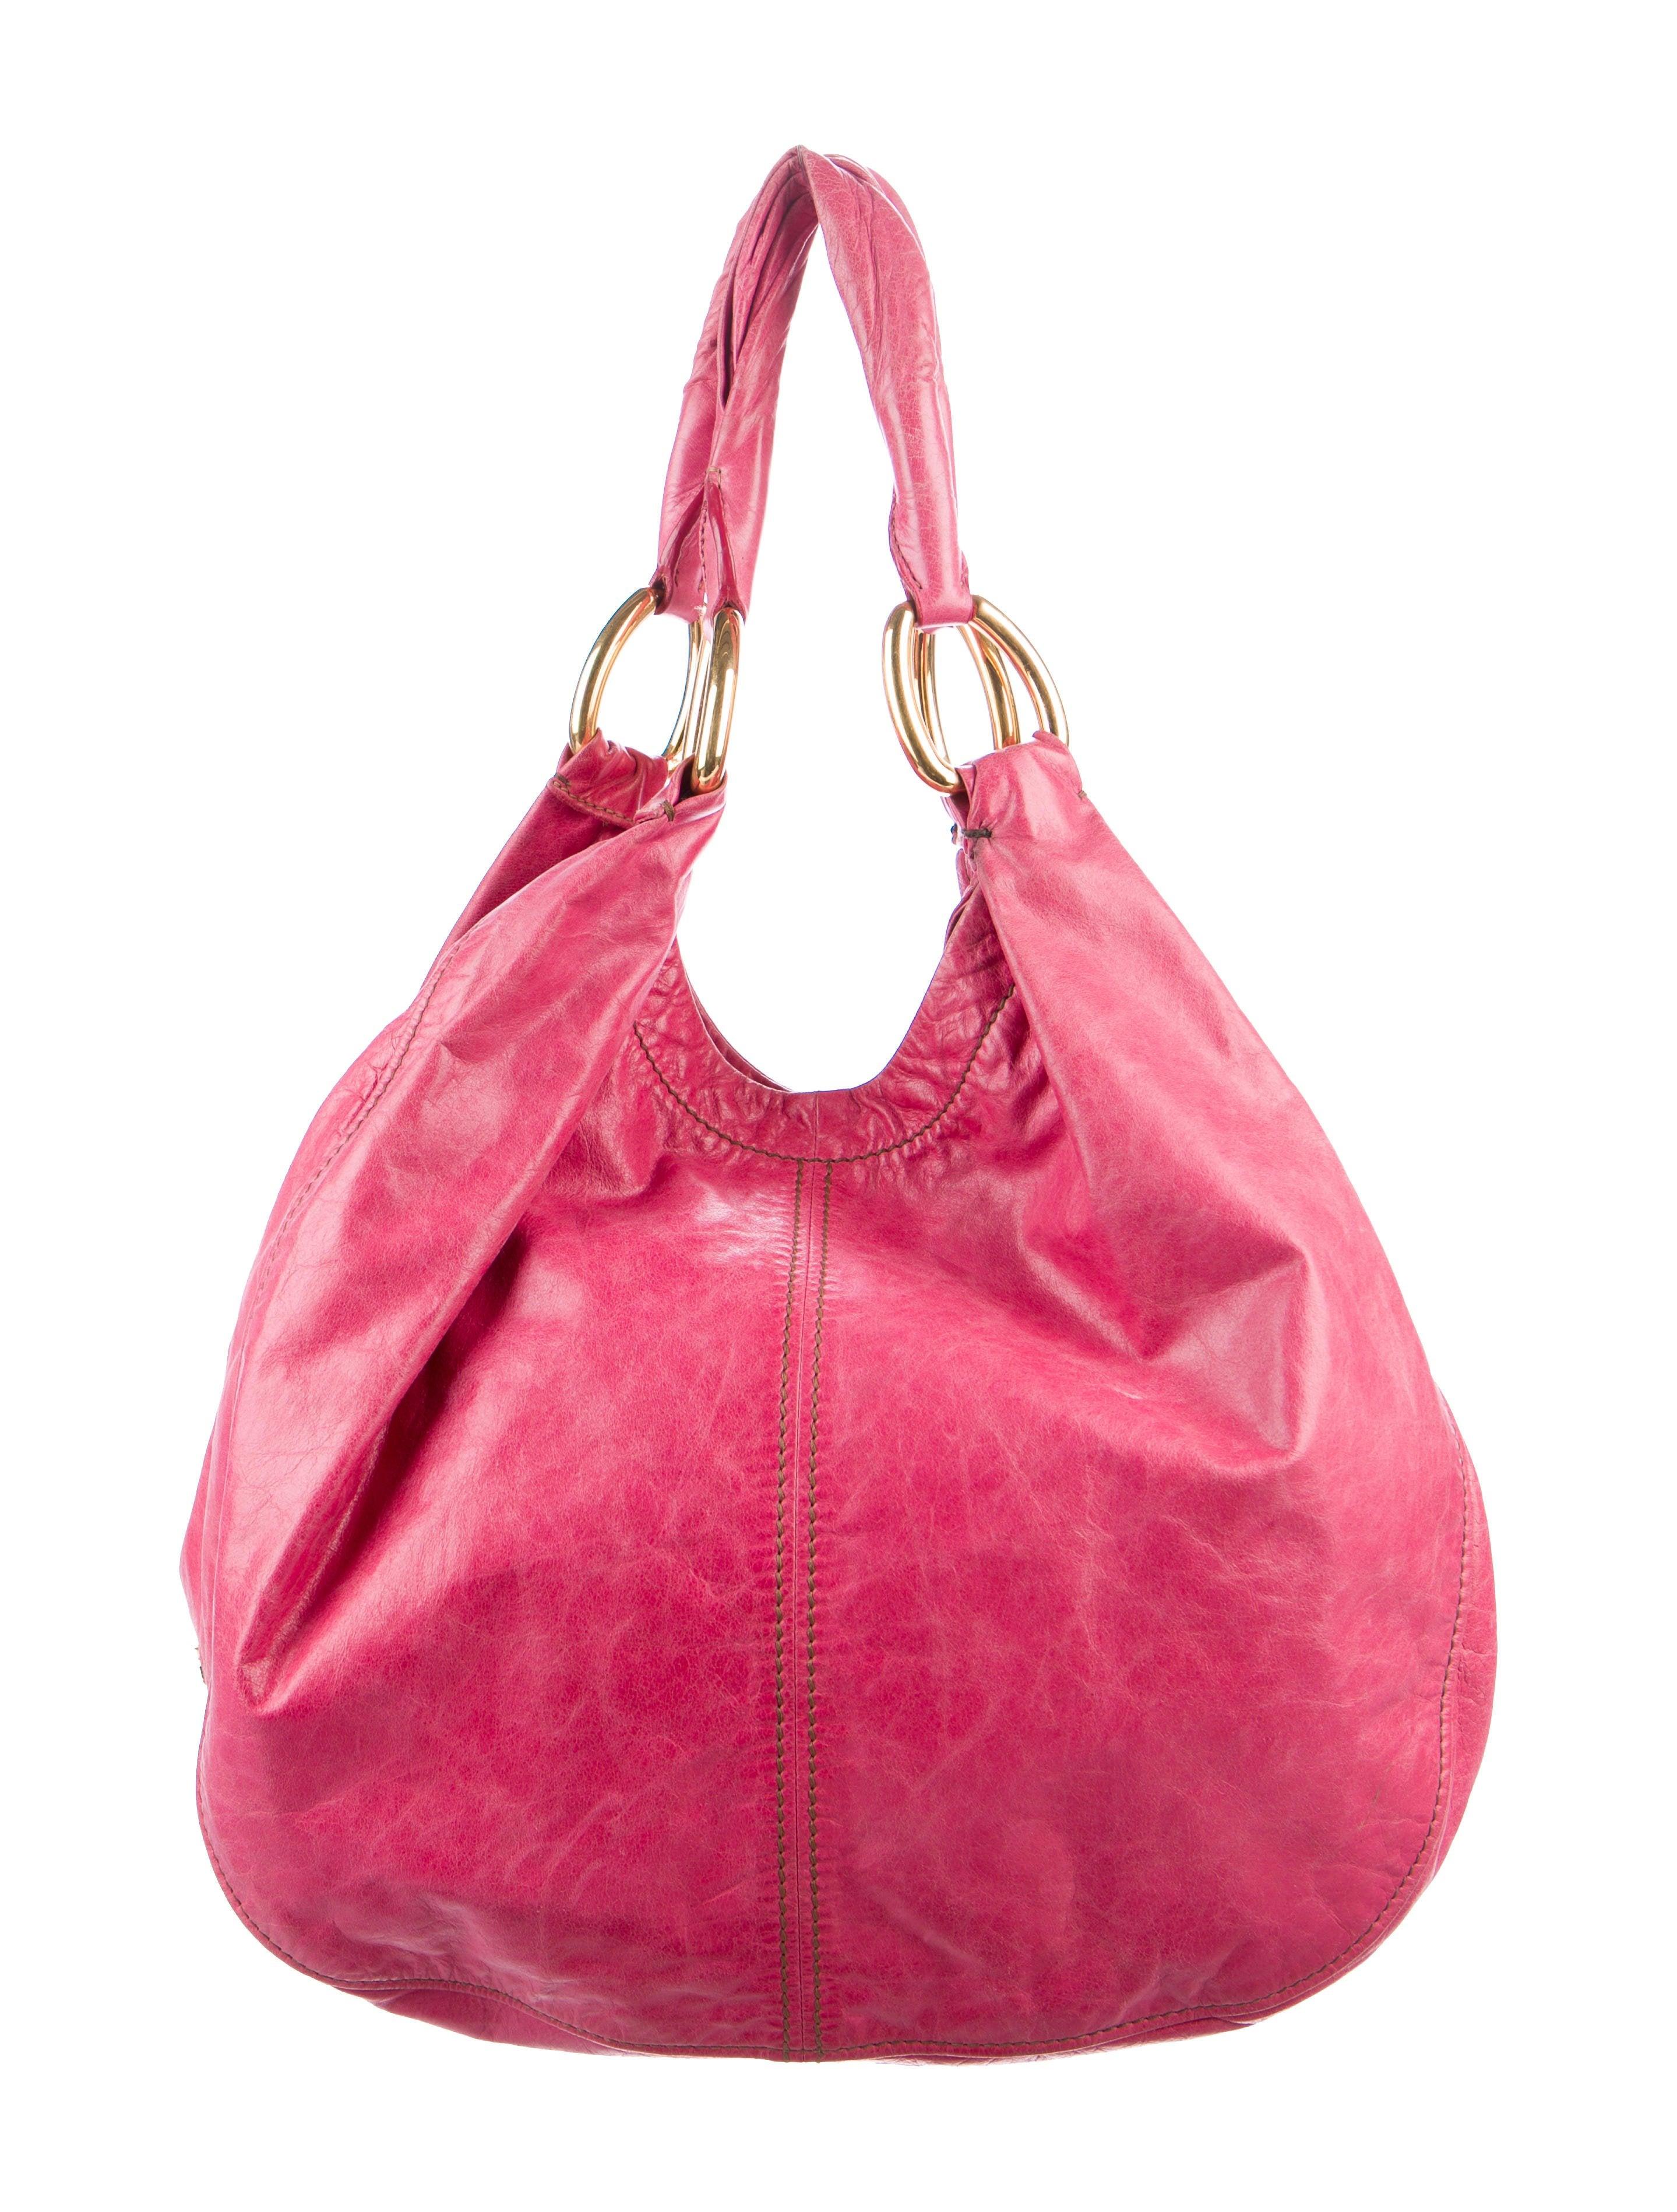 75828c567 Miu Miu Distressed Leather Hobo - Handbags - MIU61394 | The RealReal